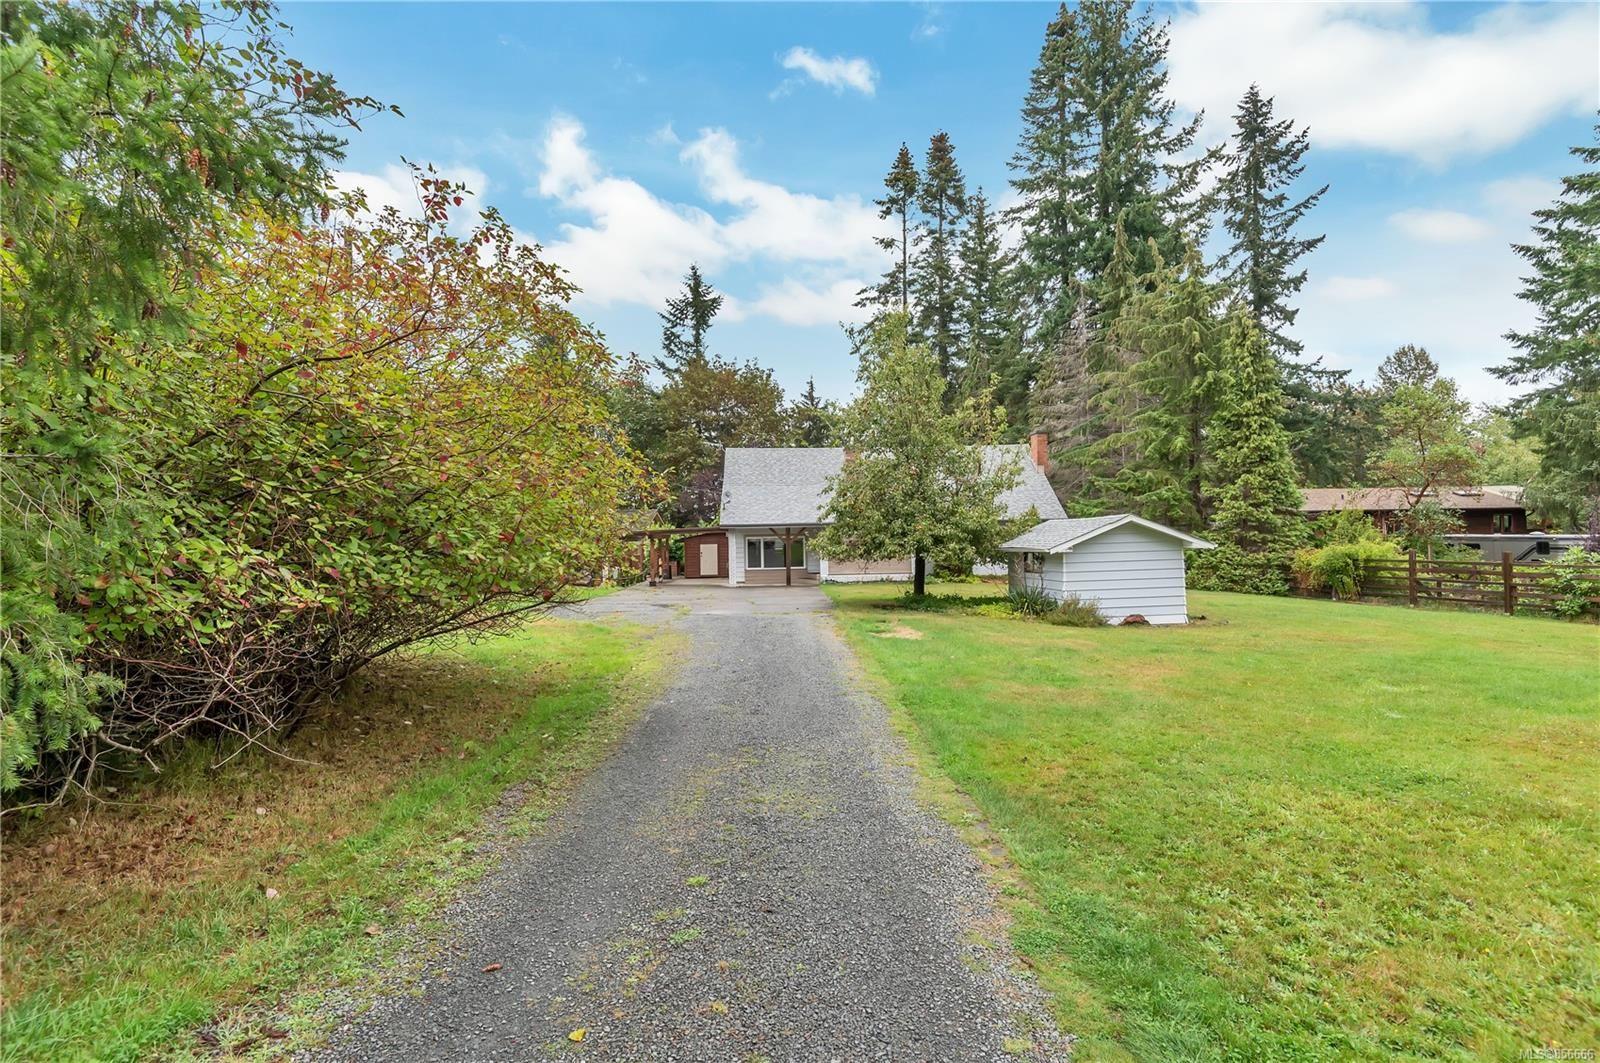 Photo 44: Photos: 2468 Oakes Rd in : CV Merville Black Creek House for sale (Comox Valley)  : MLS®# 856666